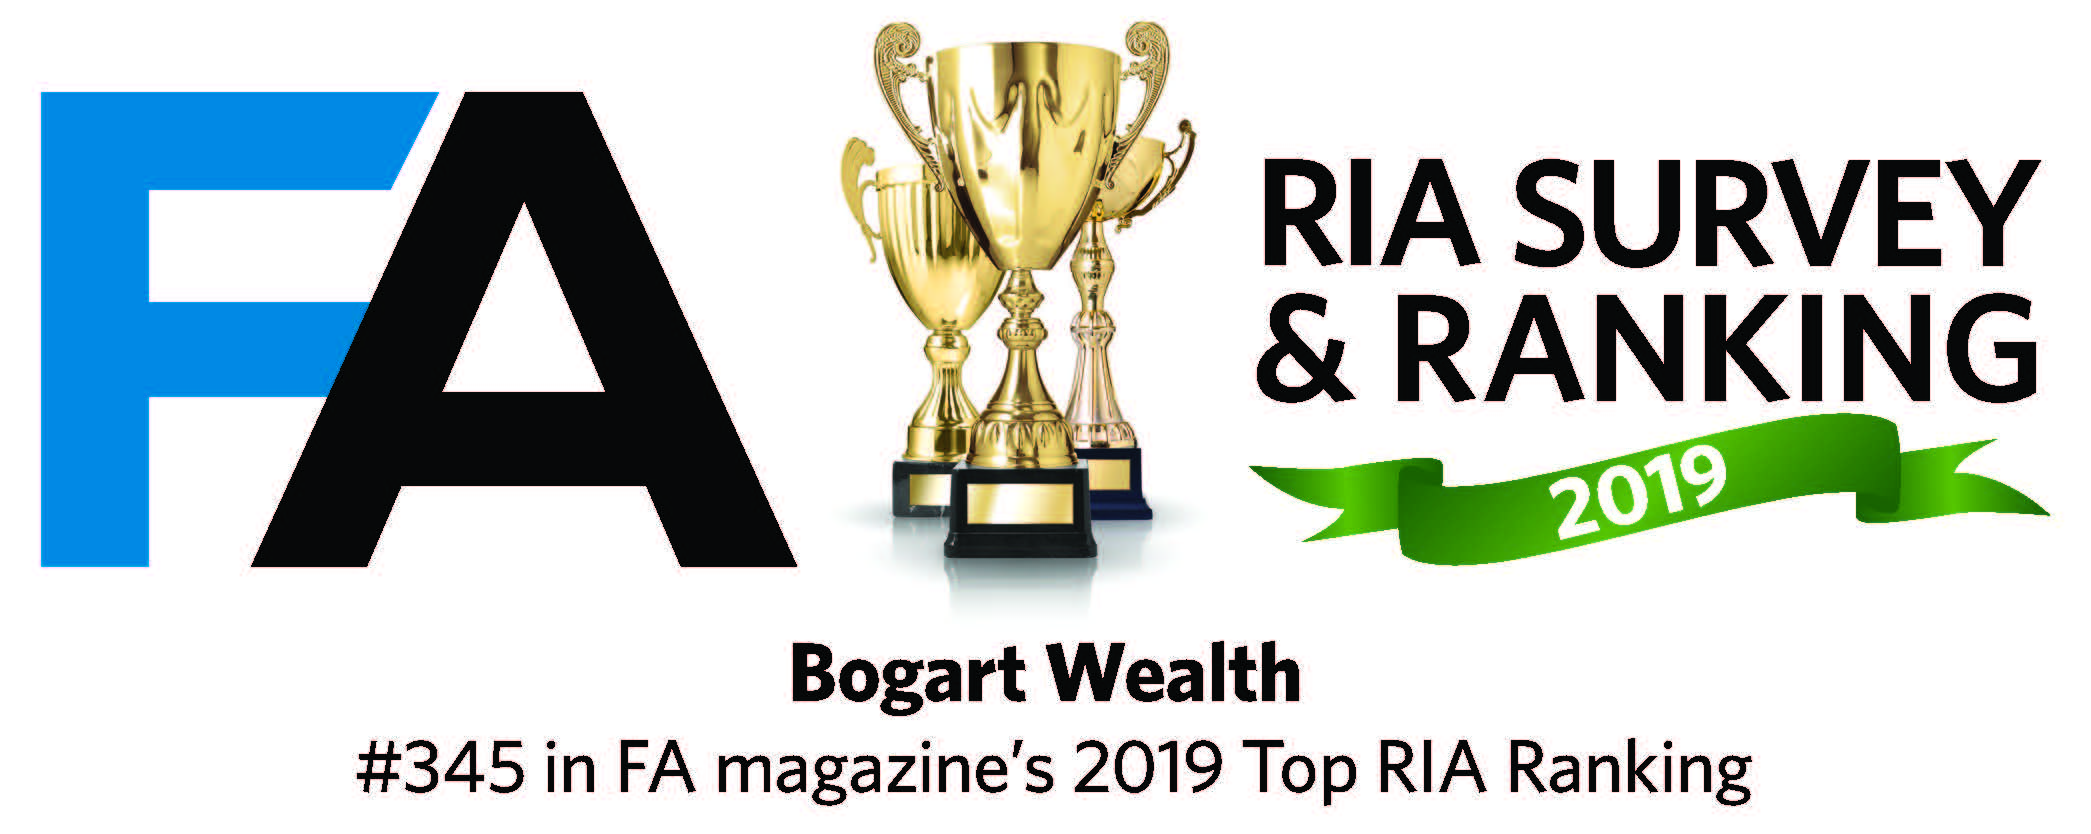 FA Magazine 07 2019 | Bogart Wealth